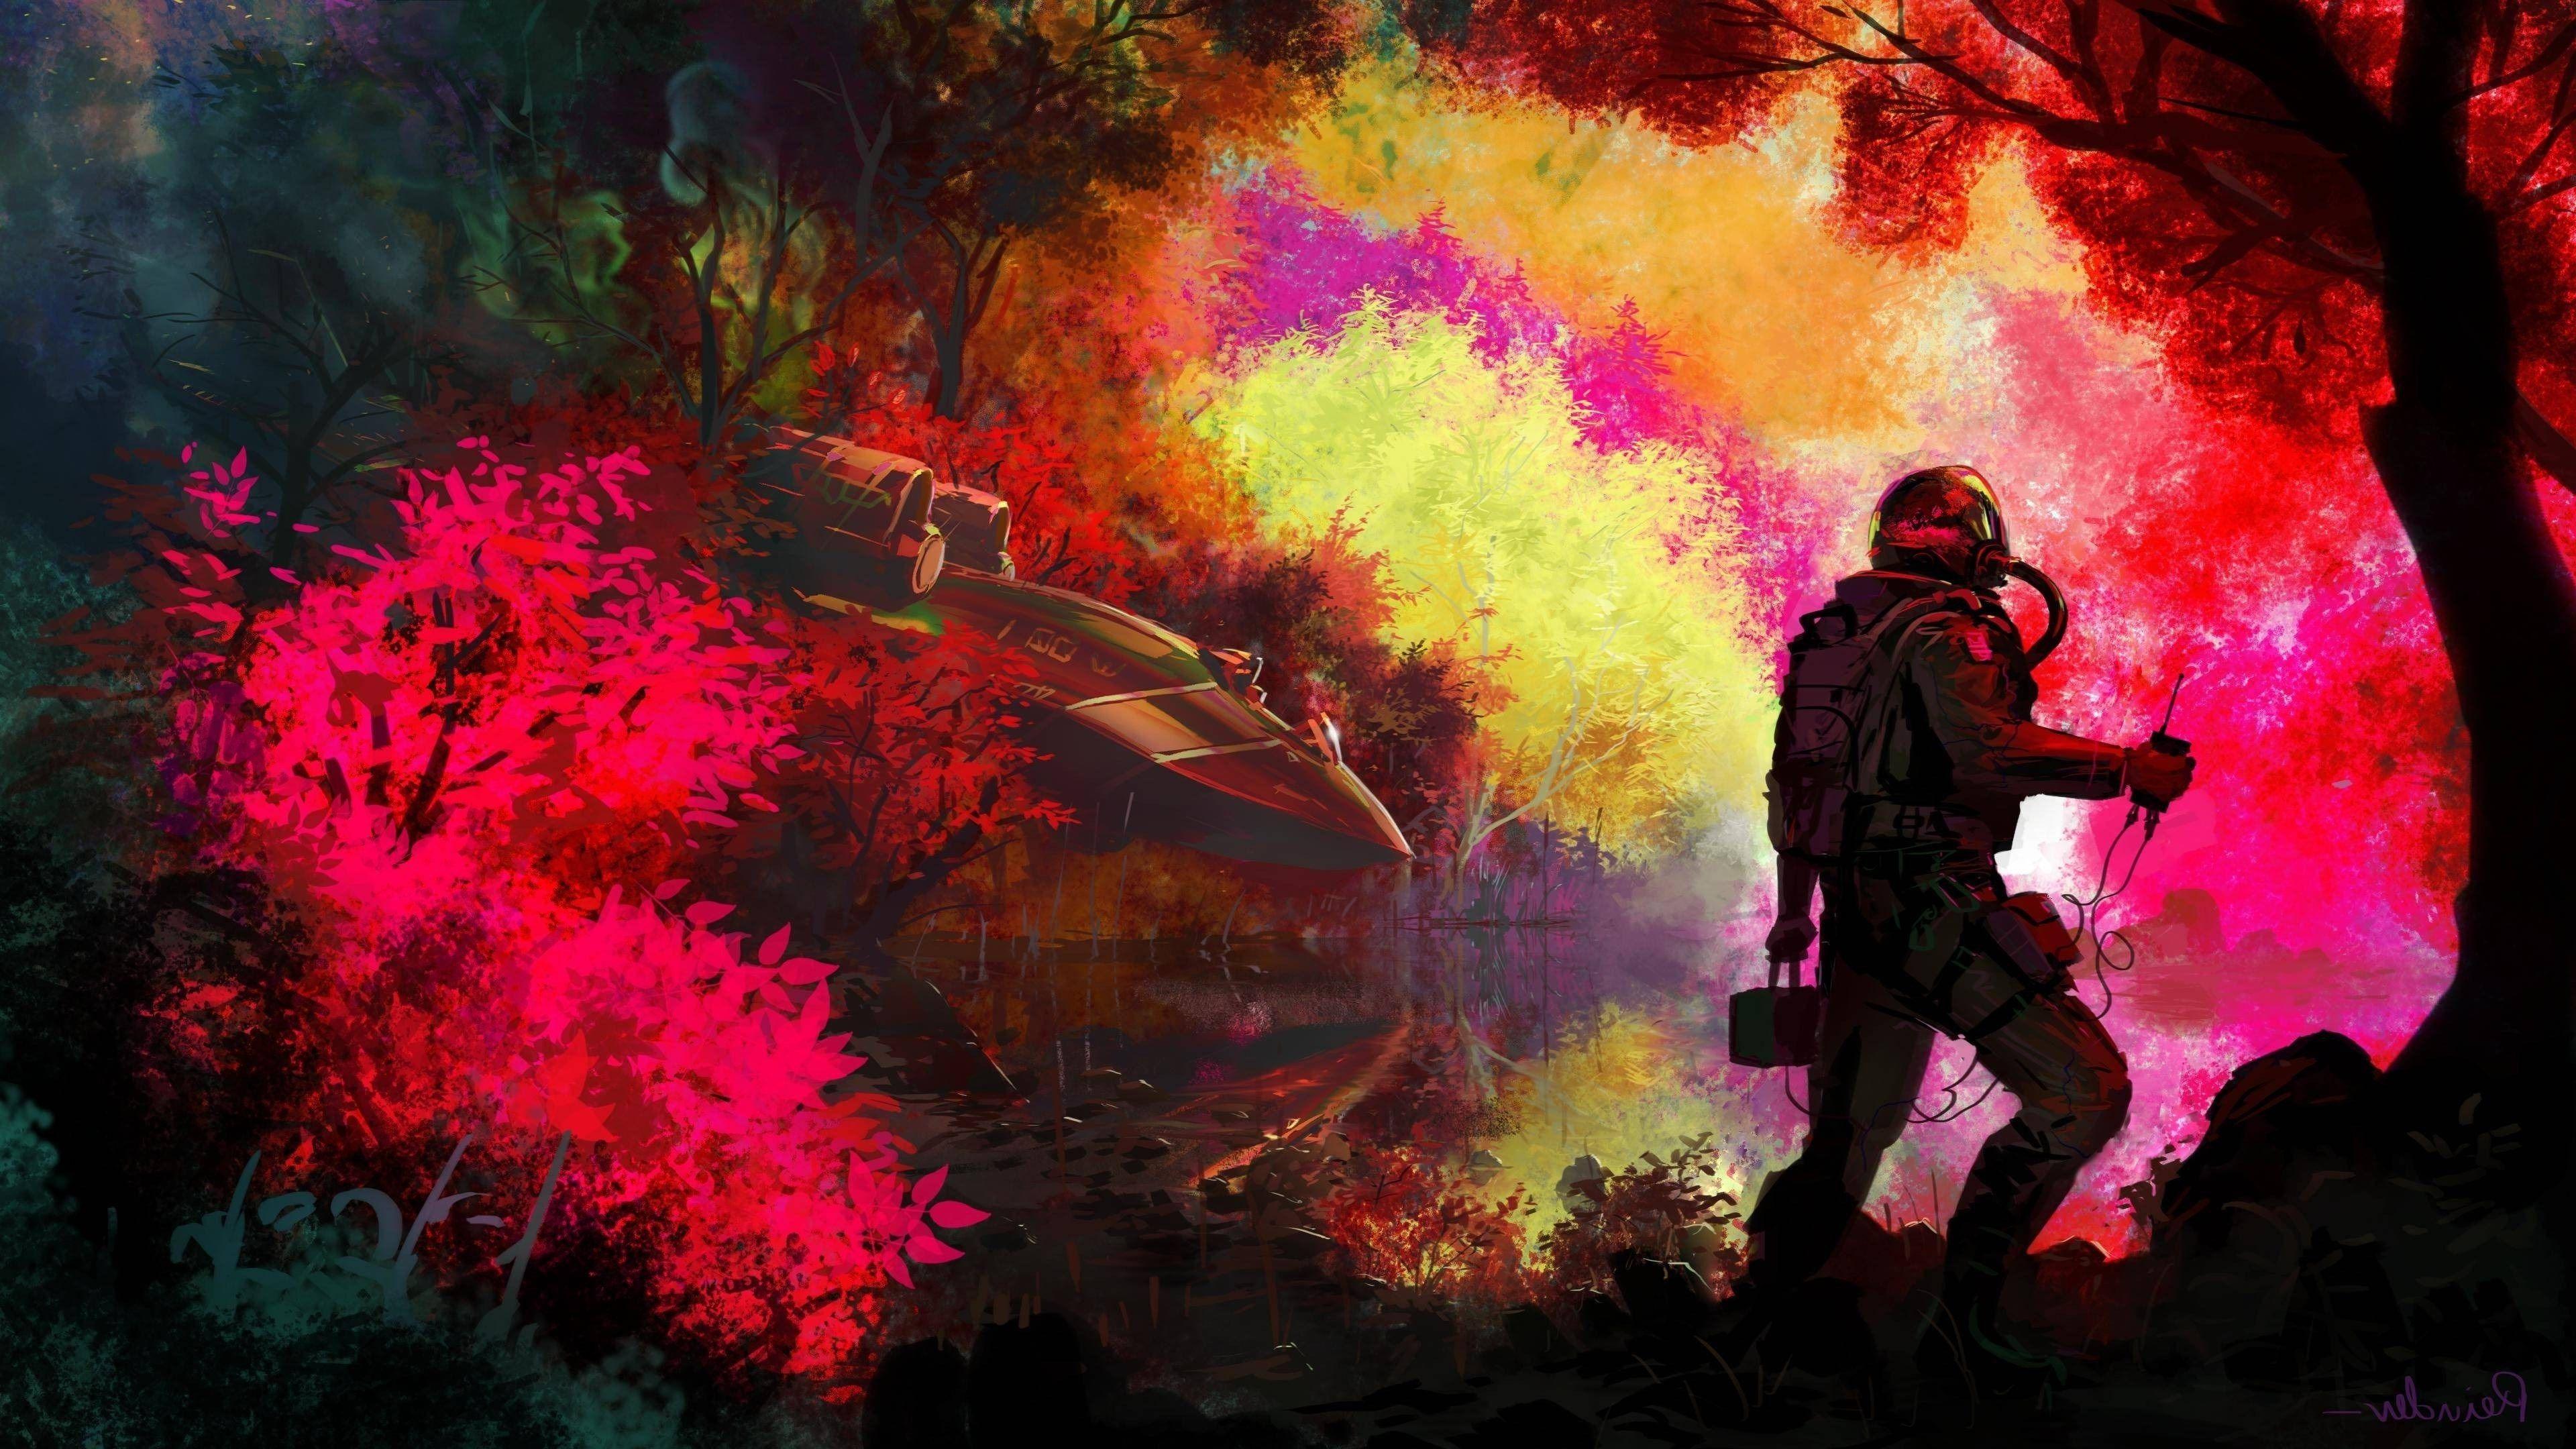 3840x2160 Astronaut 4k Free Hd Desktop Wallpaper Background